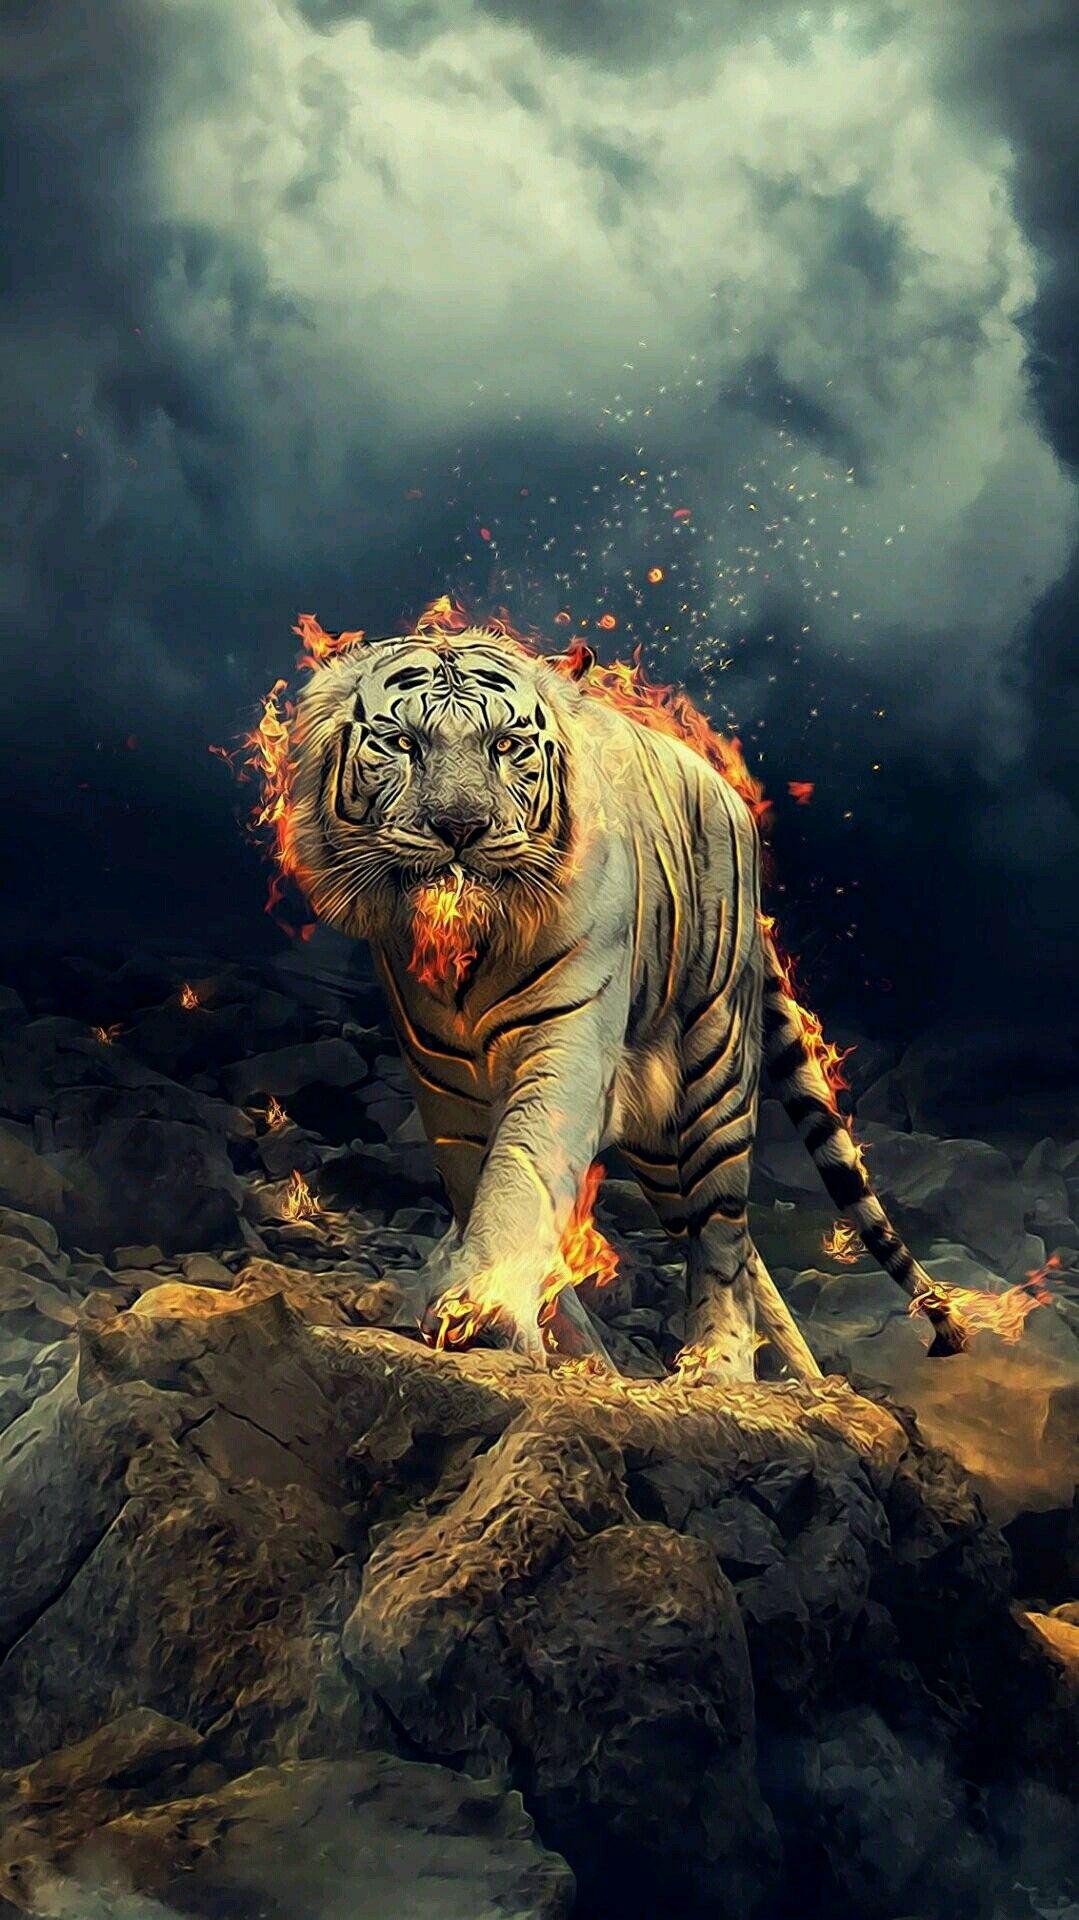 Pin by Sangeet kumaR, on darkify Tiger wallpaper, Wild